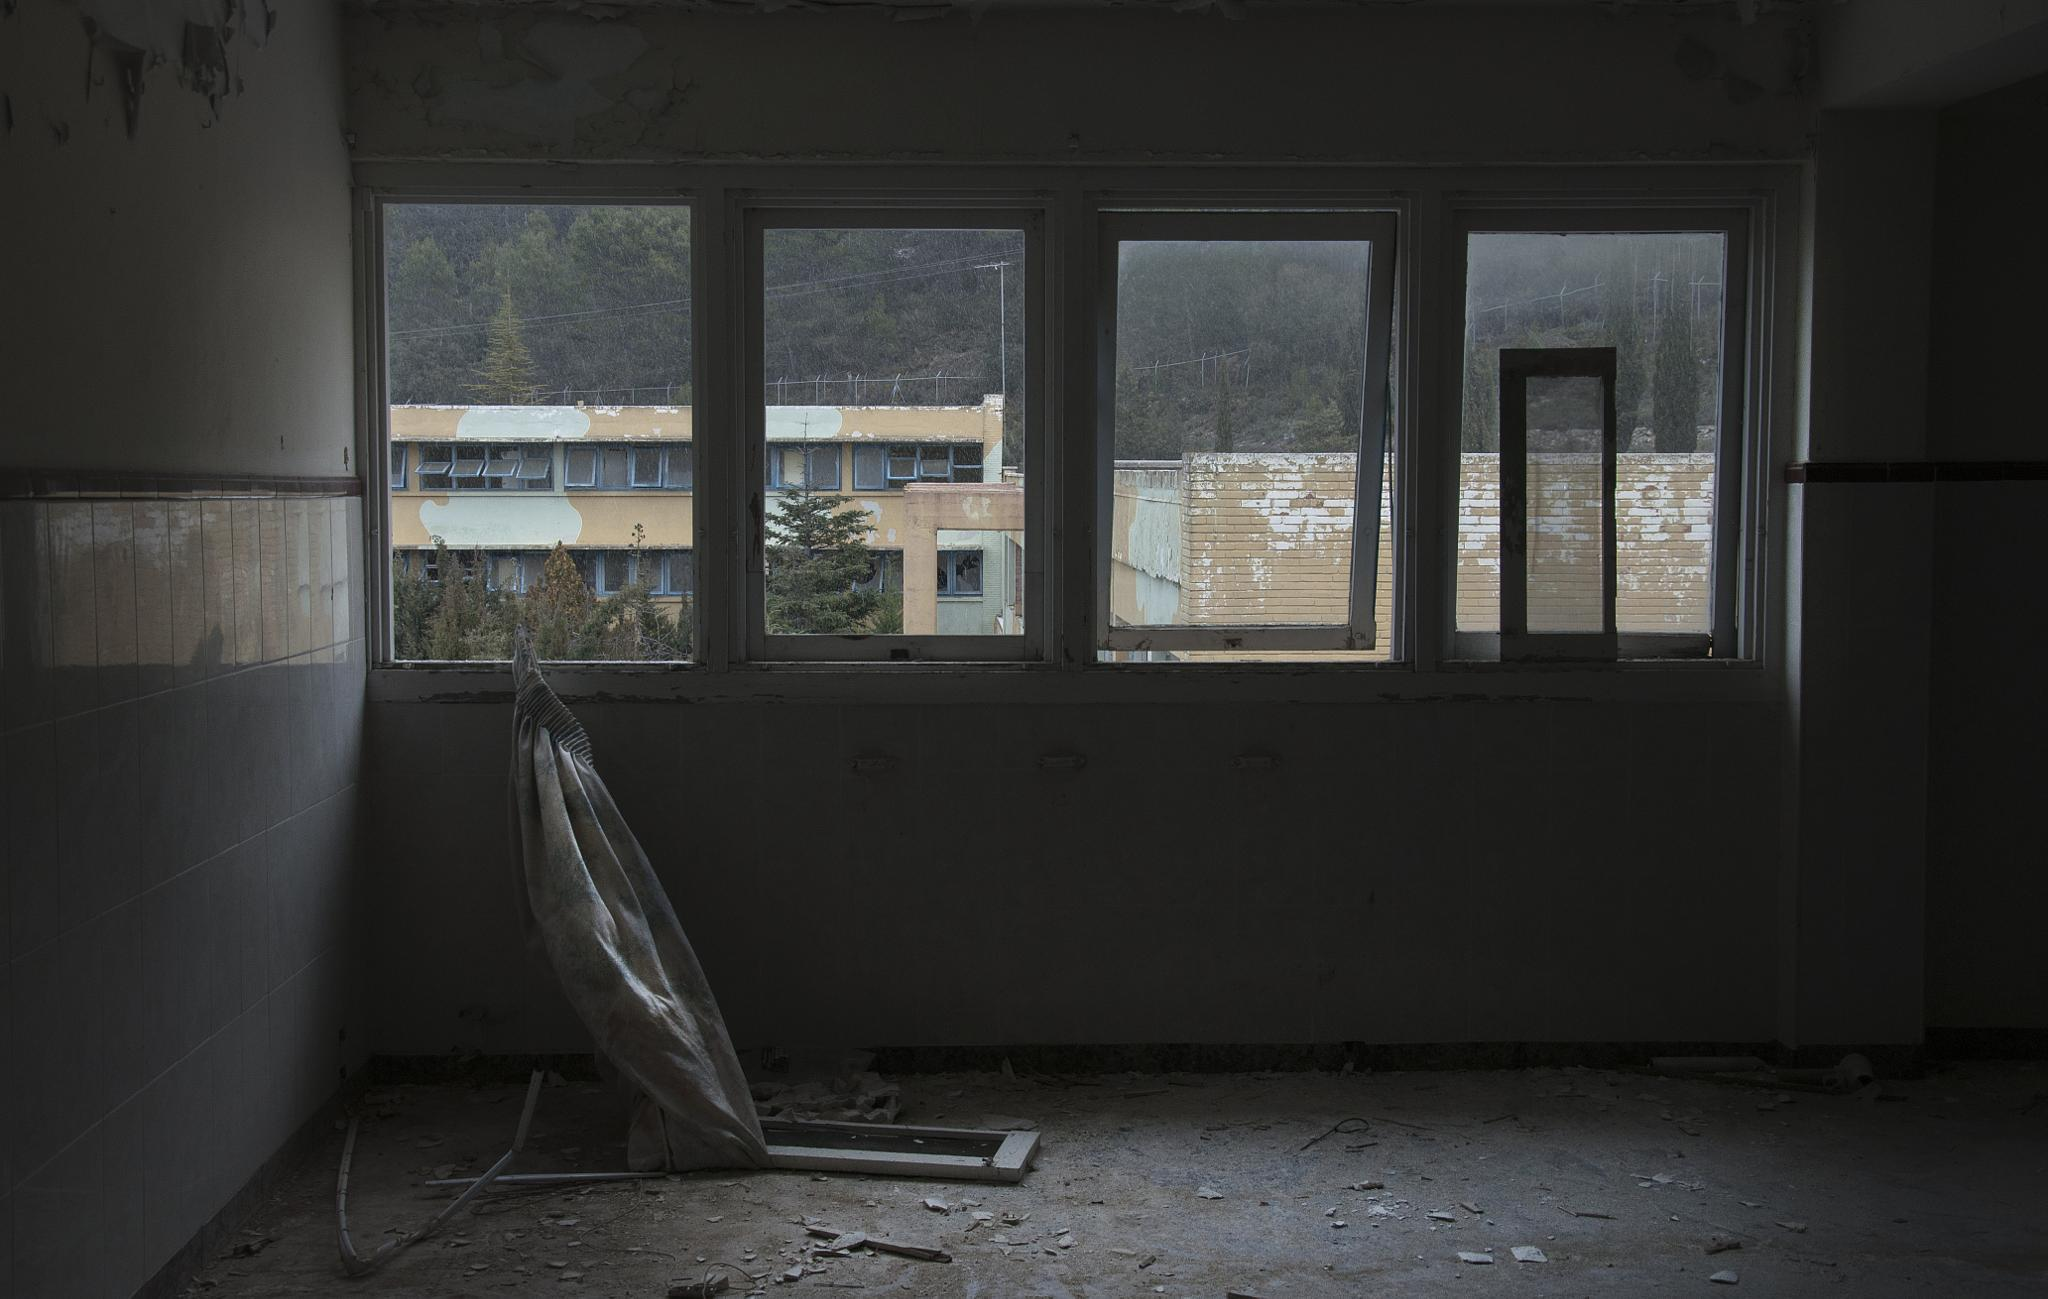 Abandoned Military Base by tonigarcia